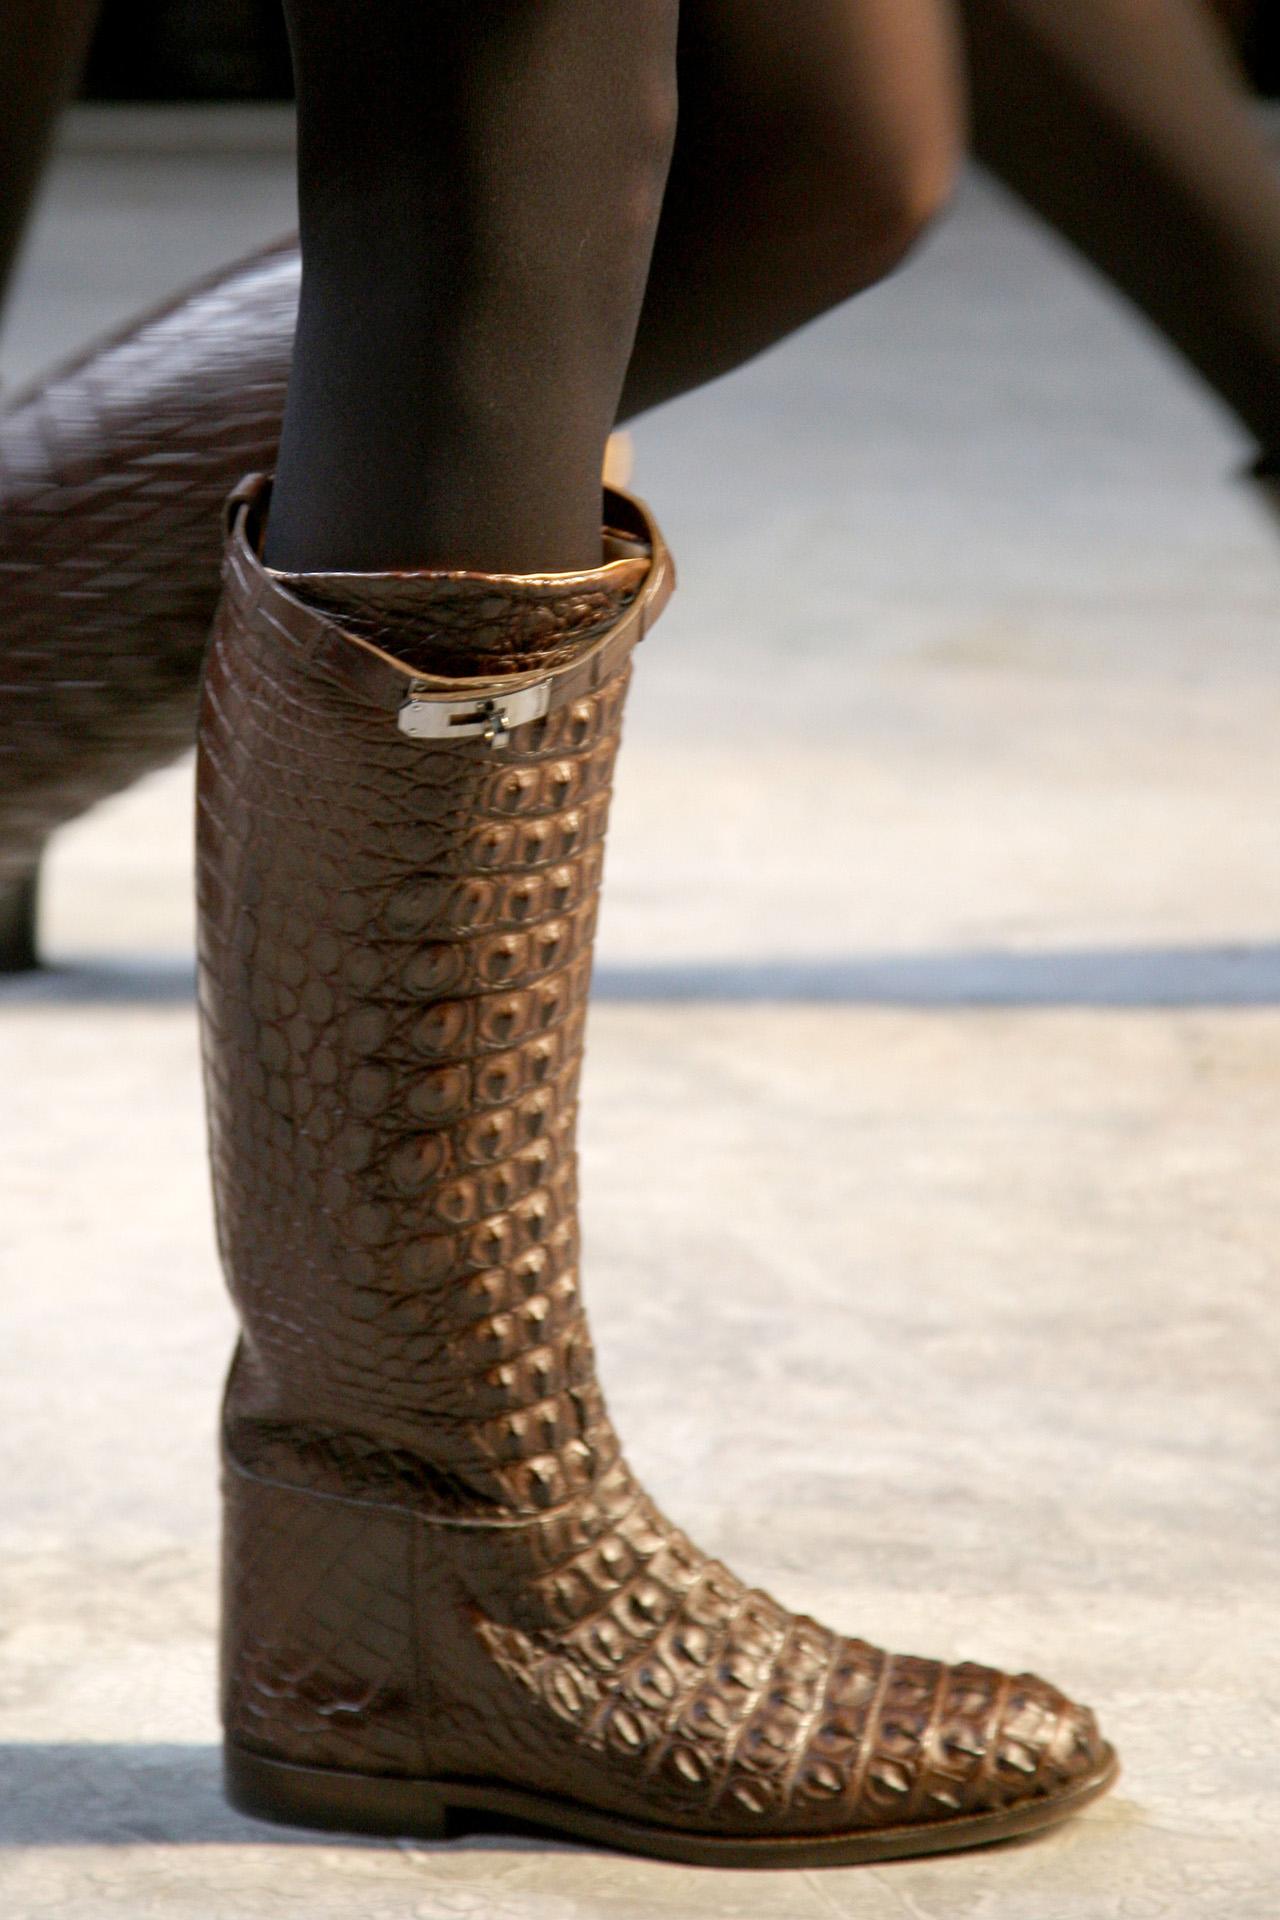 novinki-modnoj-zimnej-zhenskoj-obuvi-32